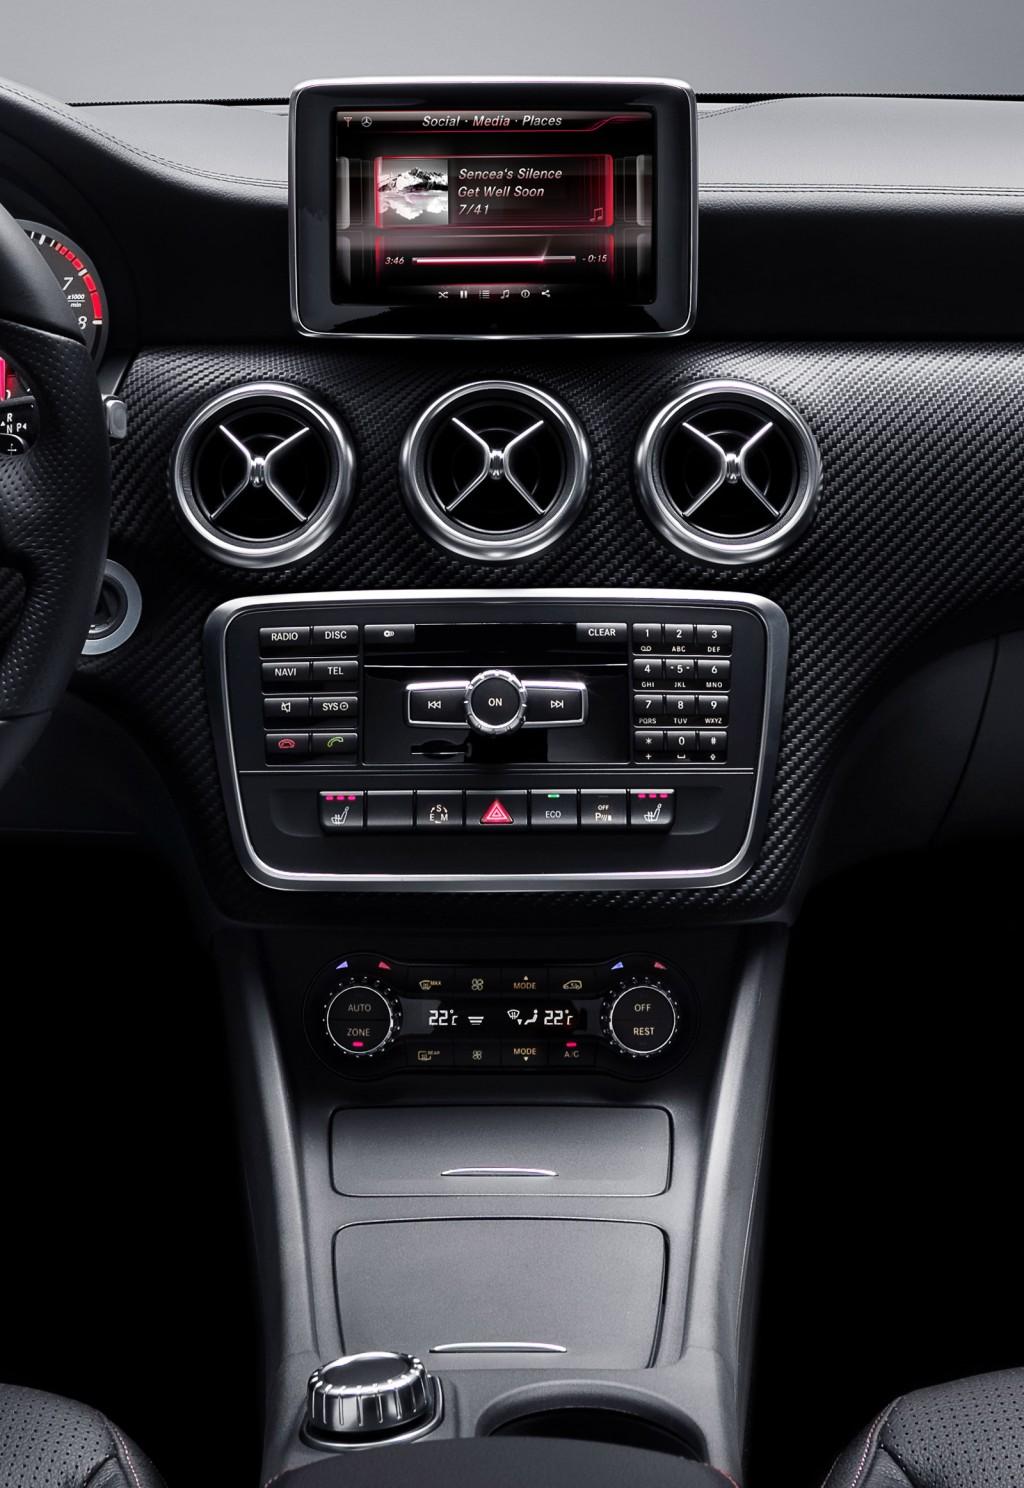 New Mercedes-Benz A Class interior